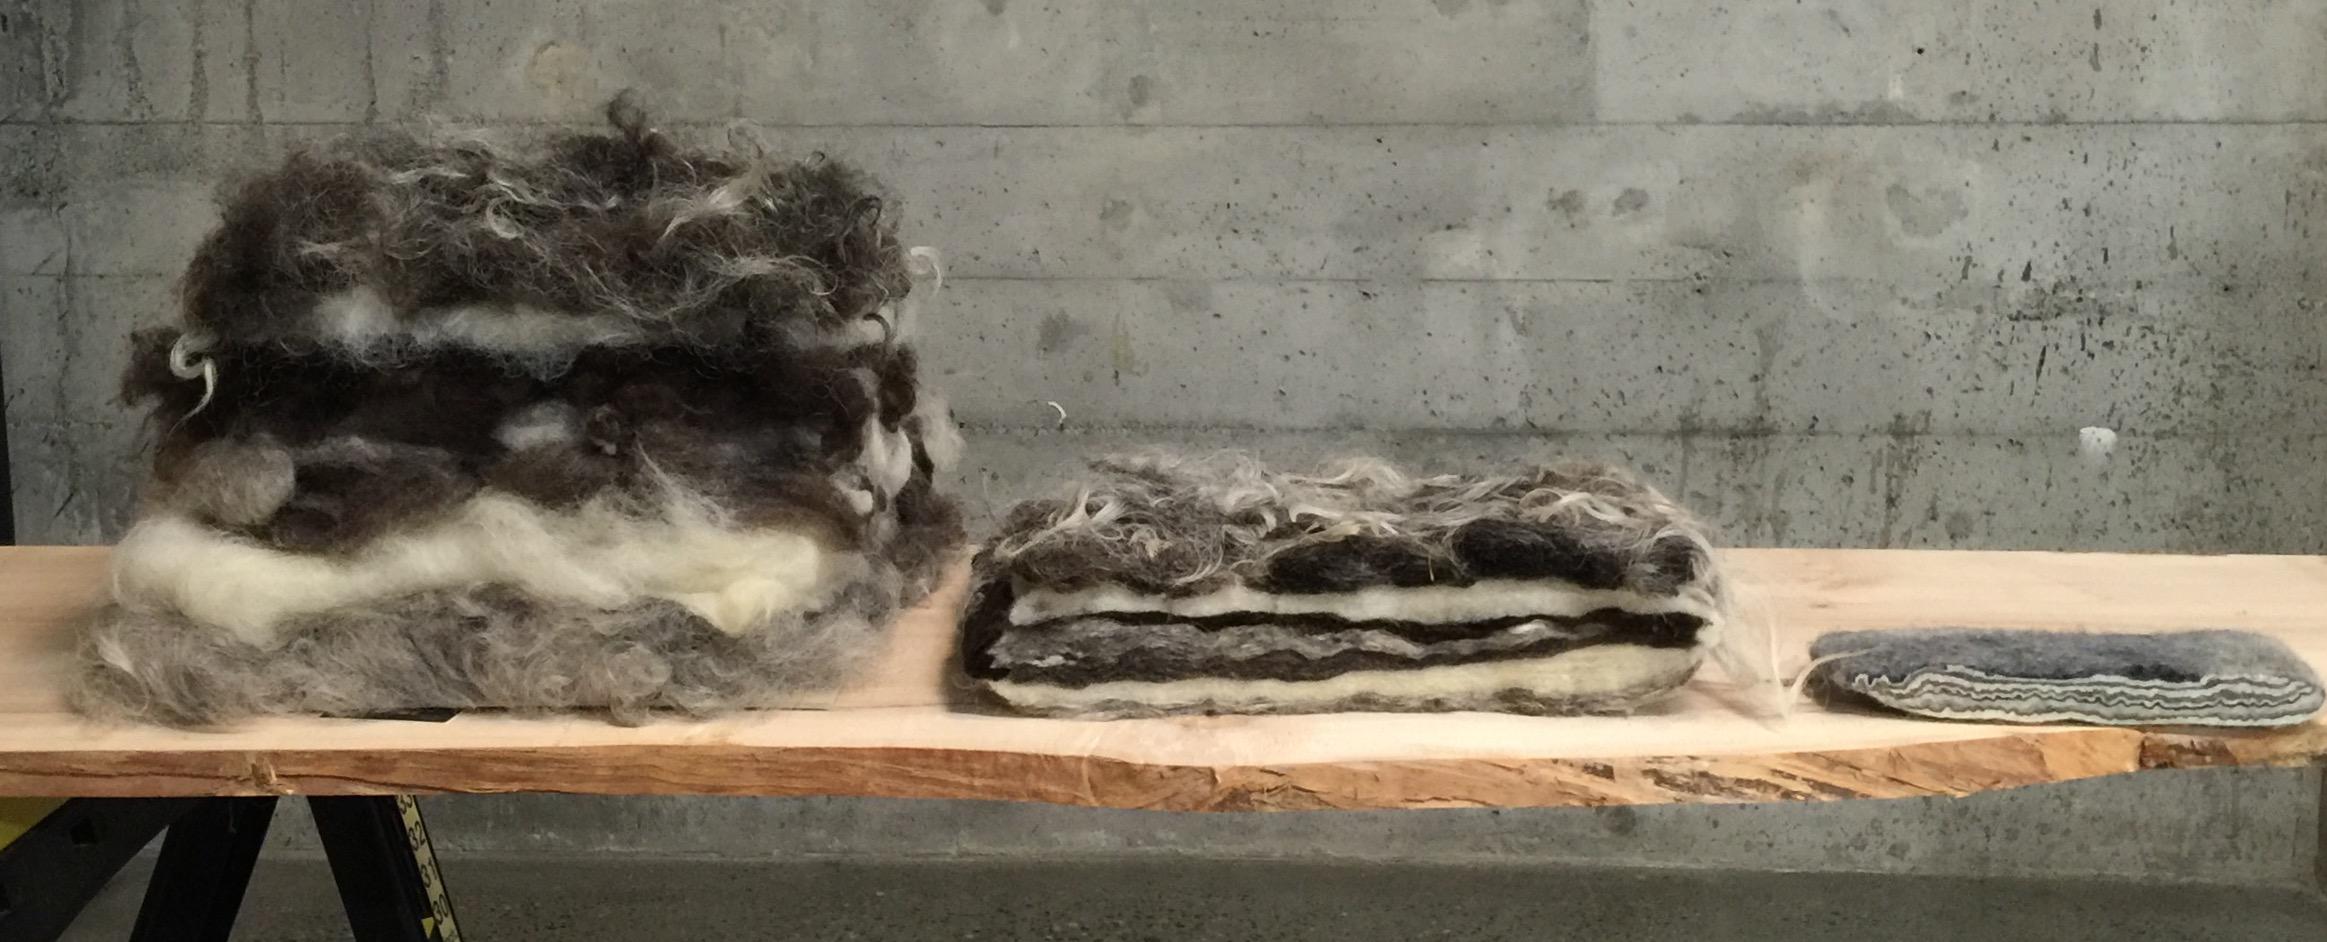 Janice Arnold, wool